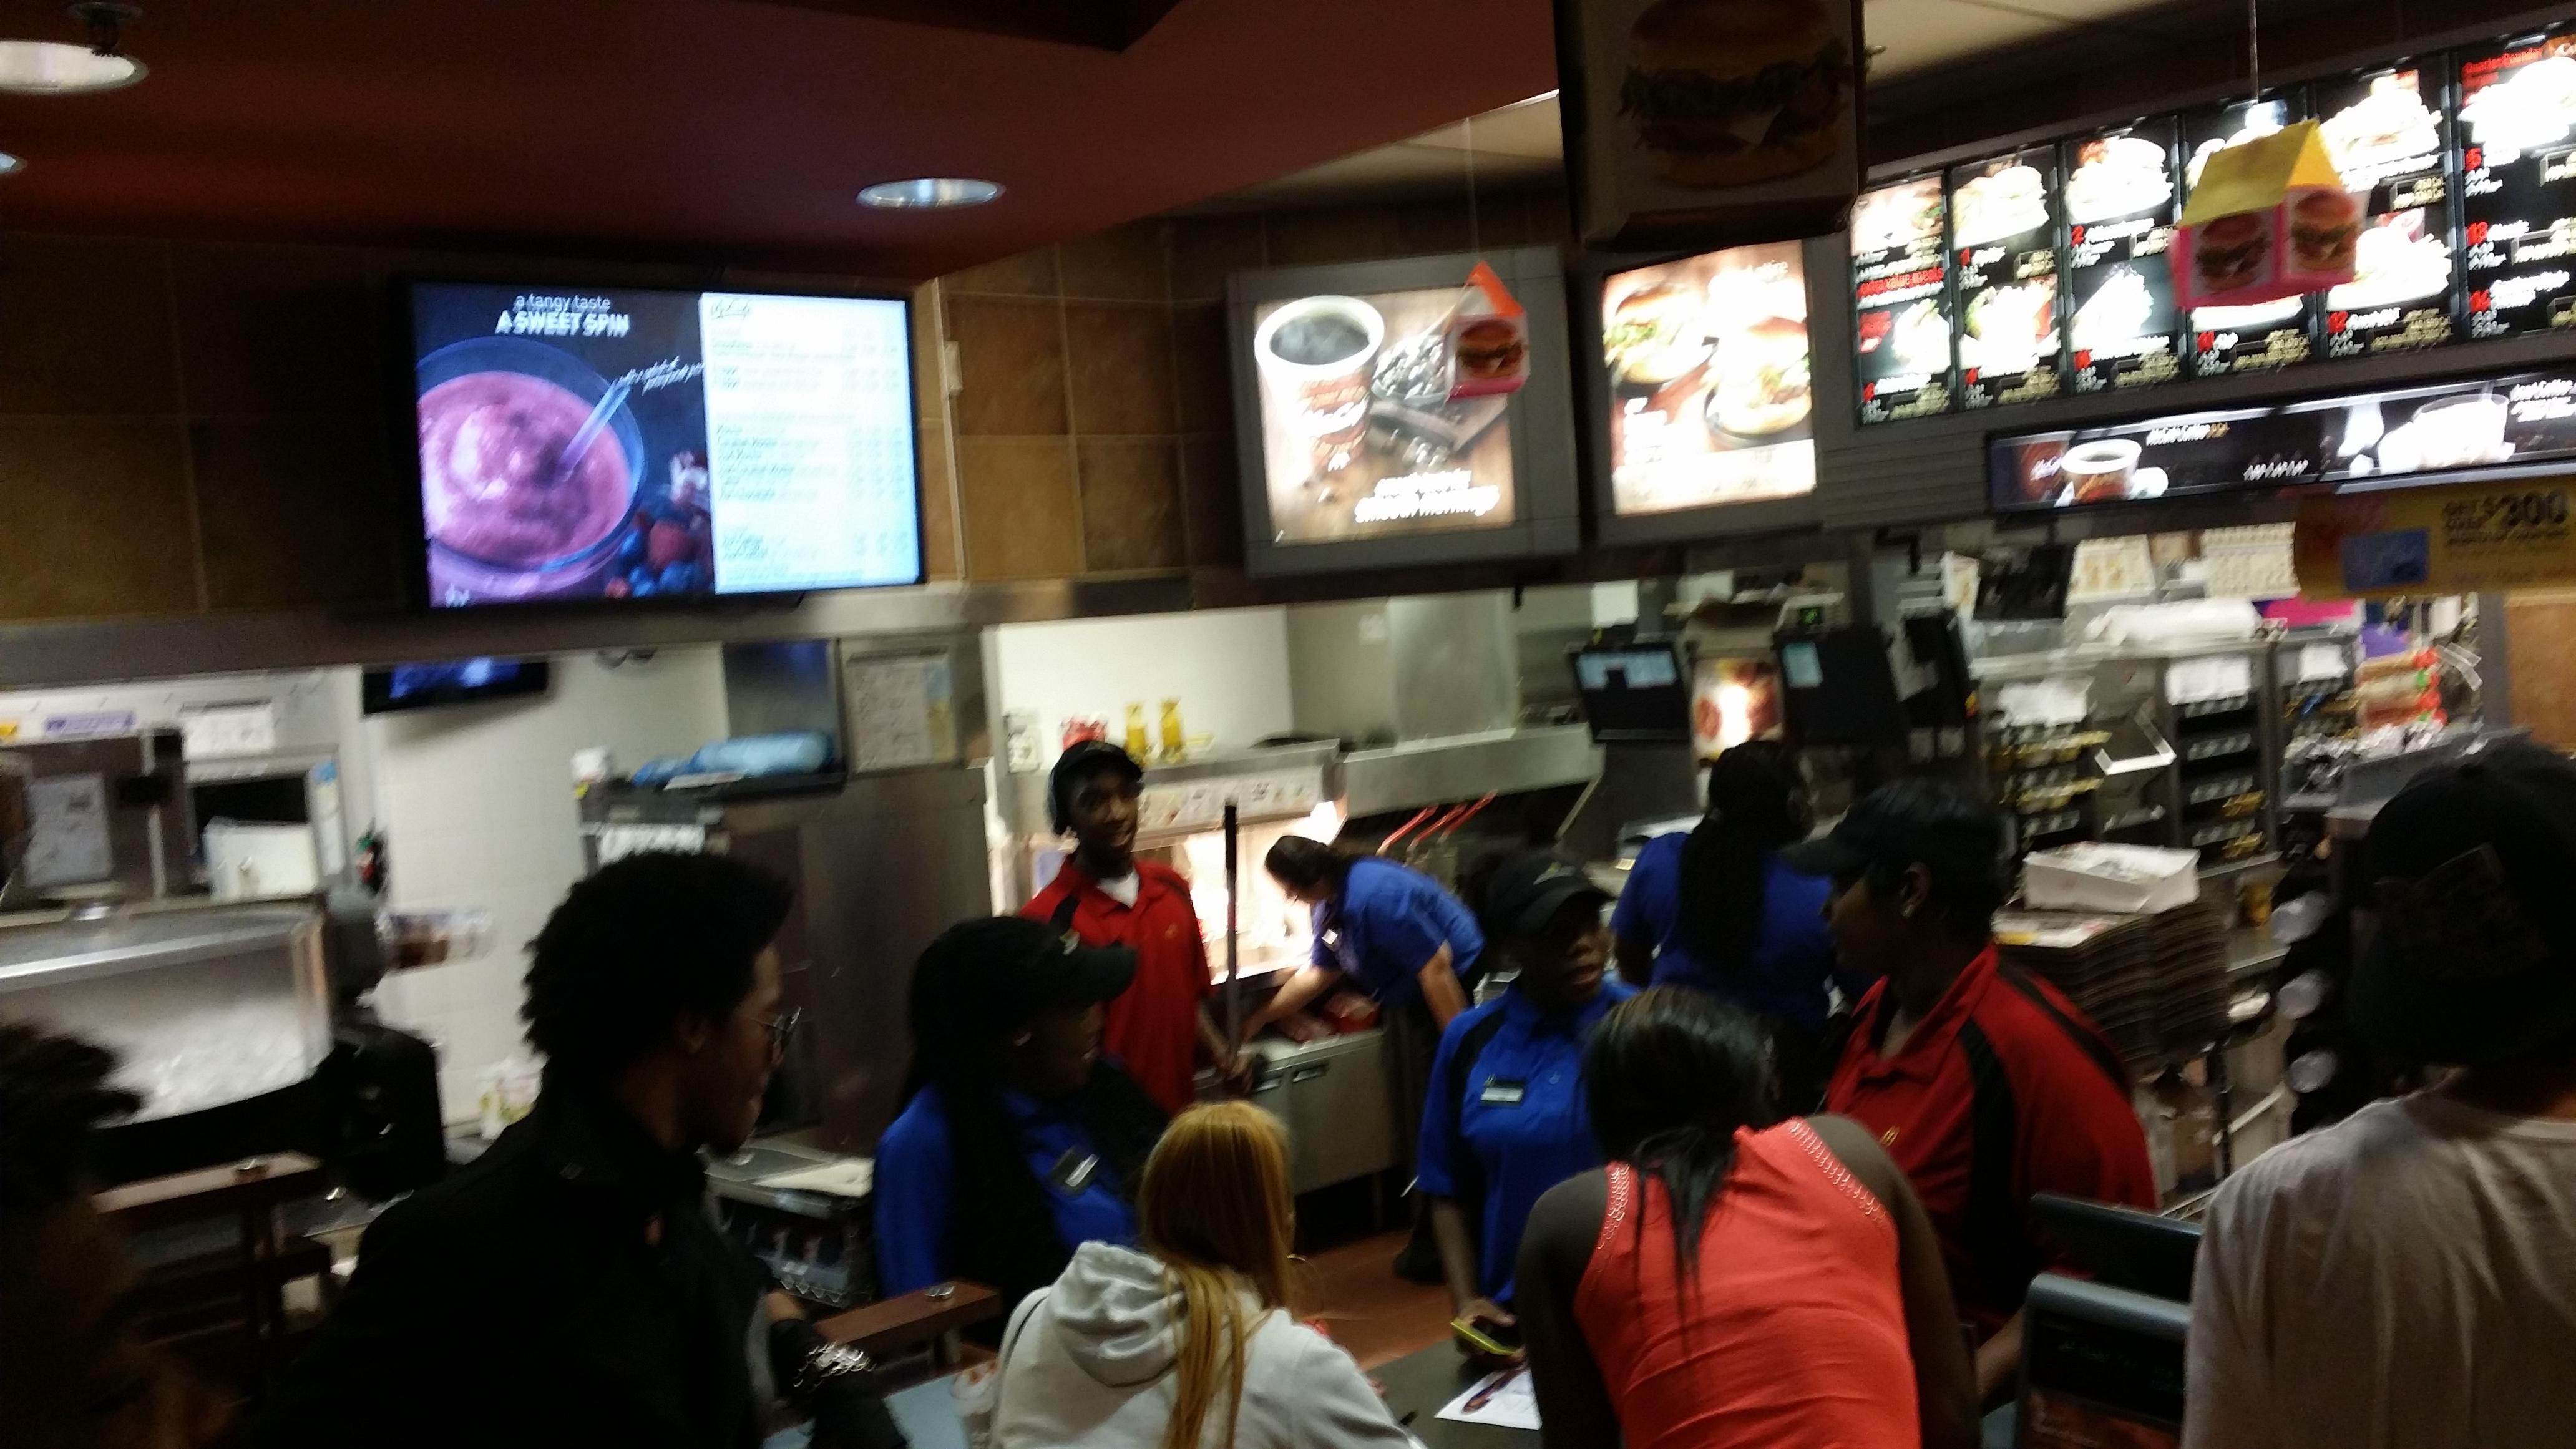 Enyx and Queen Photos Fans@McDonalds